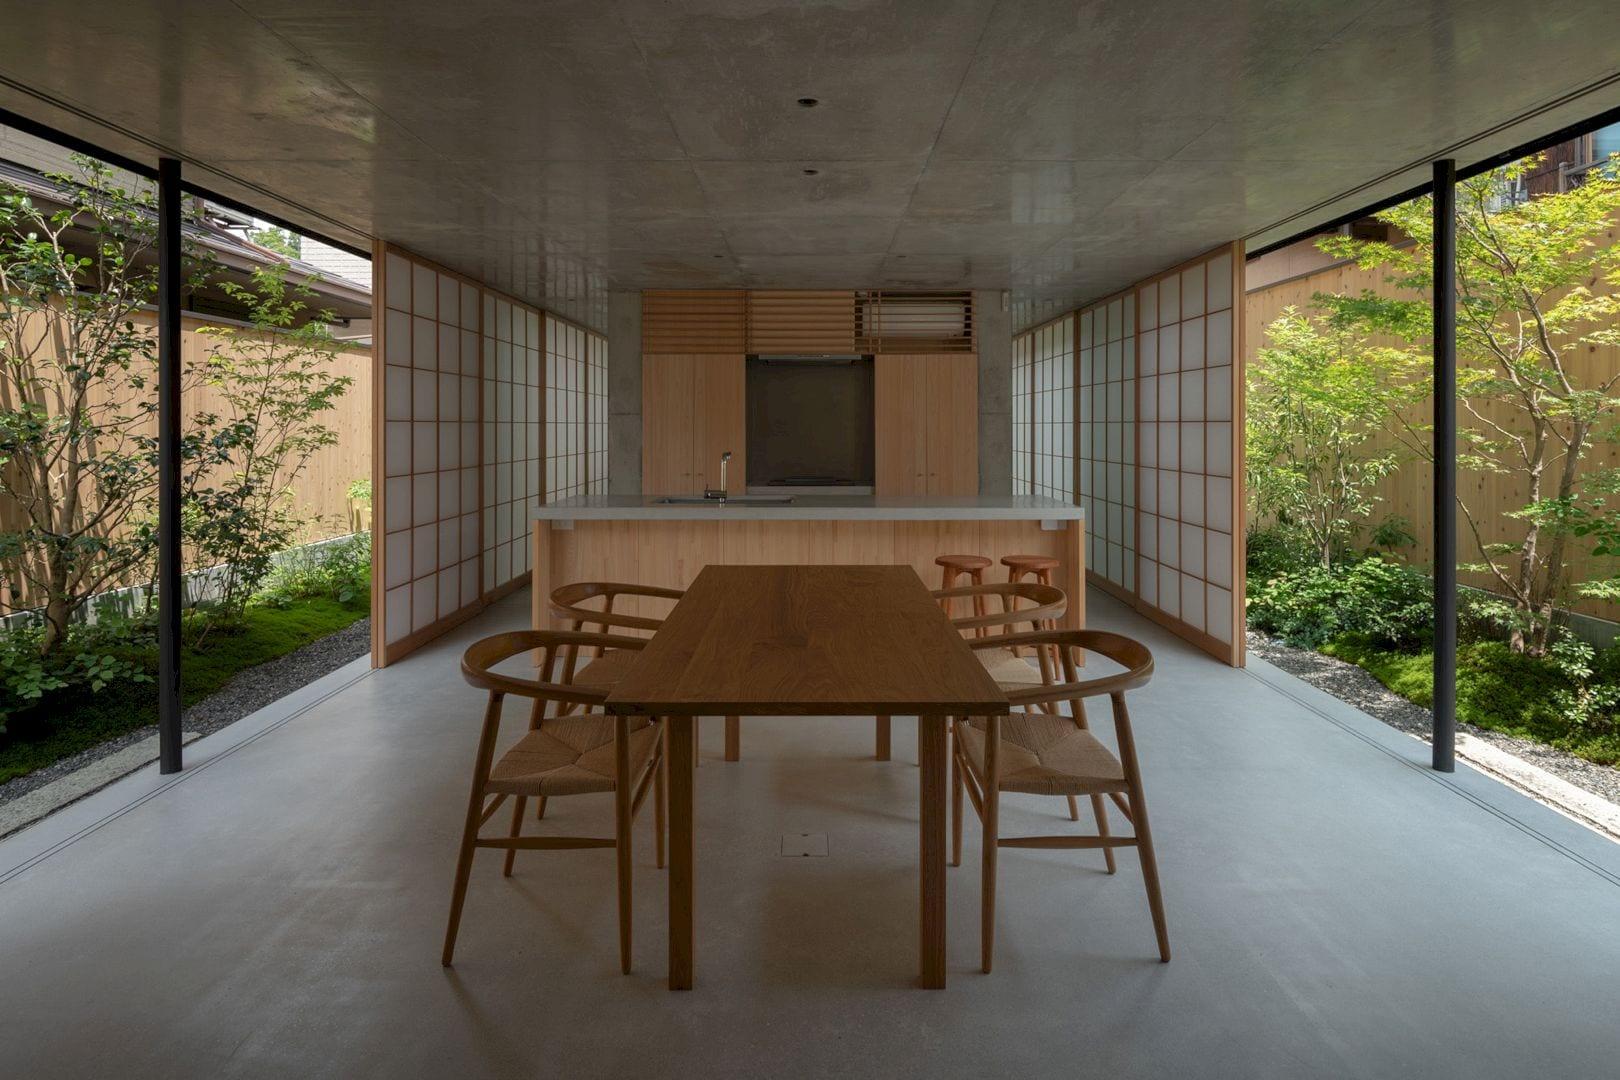 House In Ginkakuji Mae By Kazuya Morita Architecture Studio 18